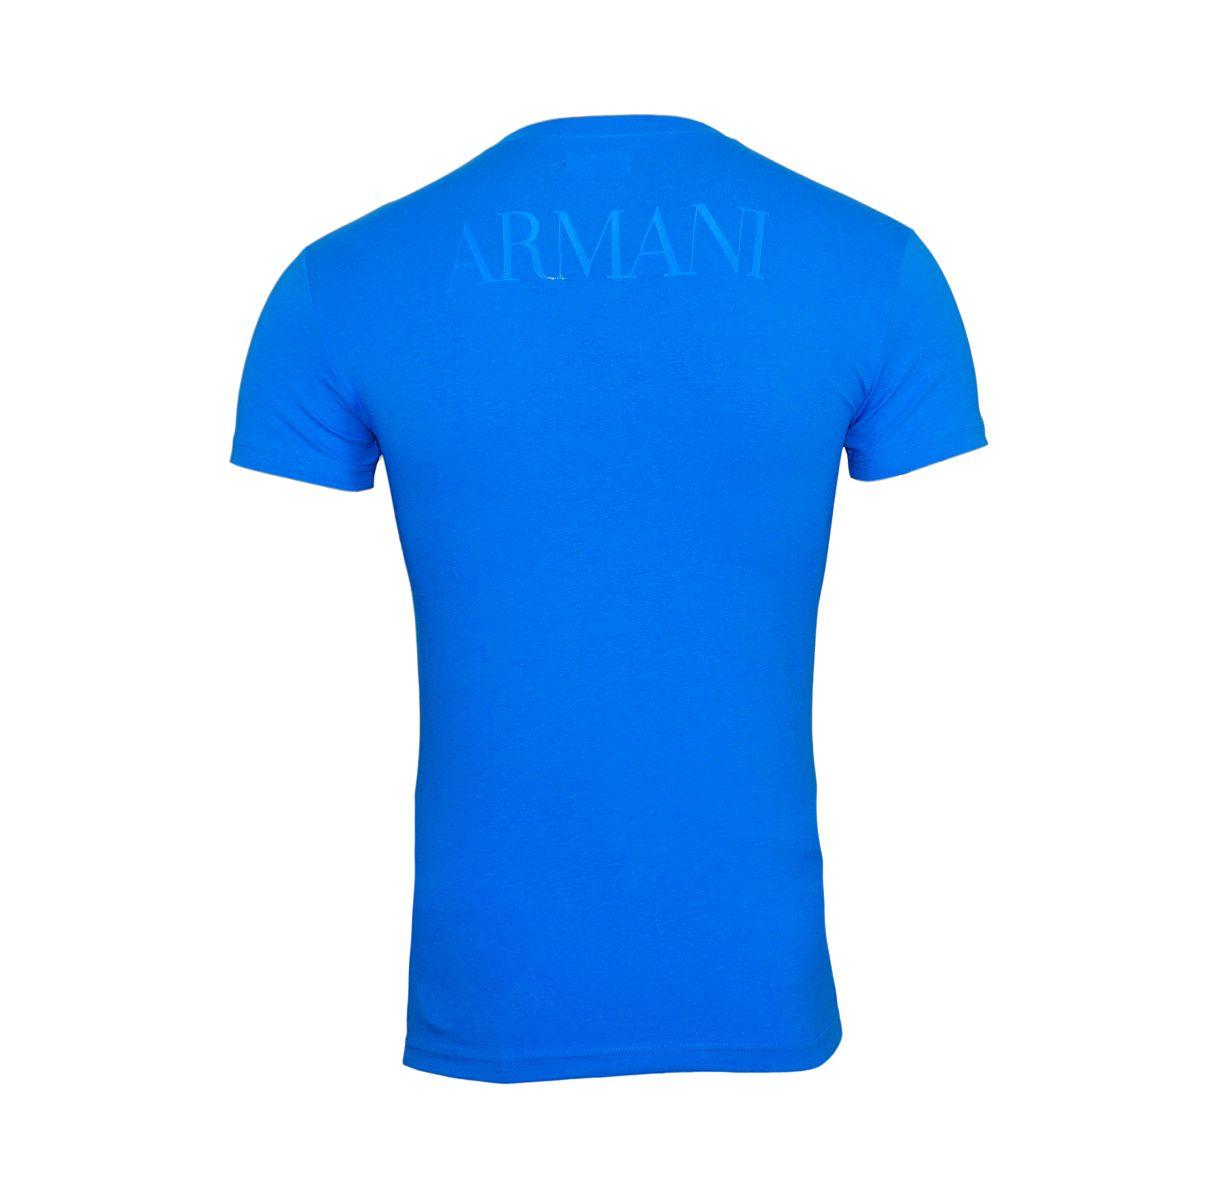 Emporio Armani T-Shirt Rundhals 111035 8P516 20833 CIELO W18-EATS1